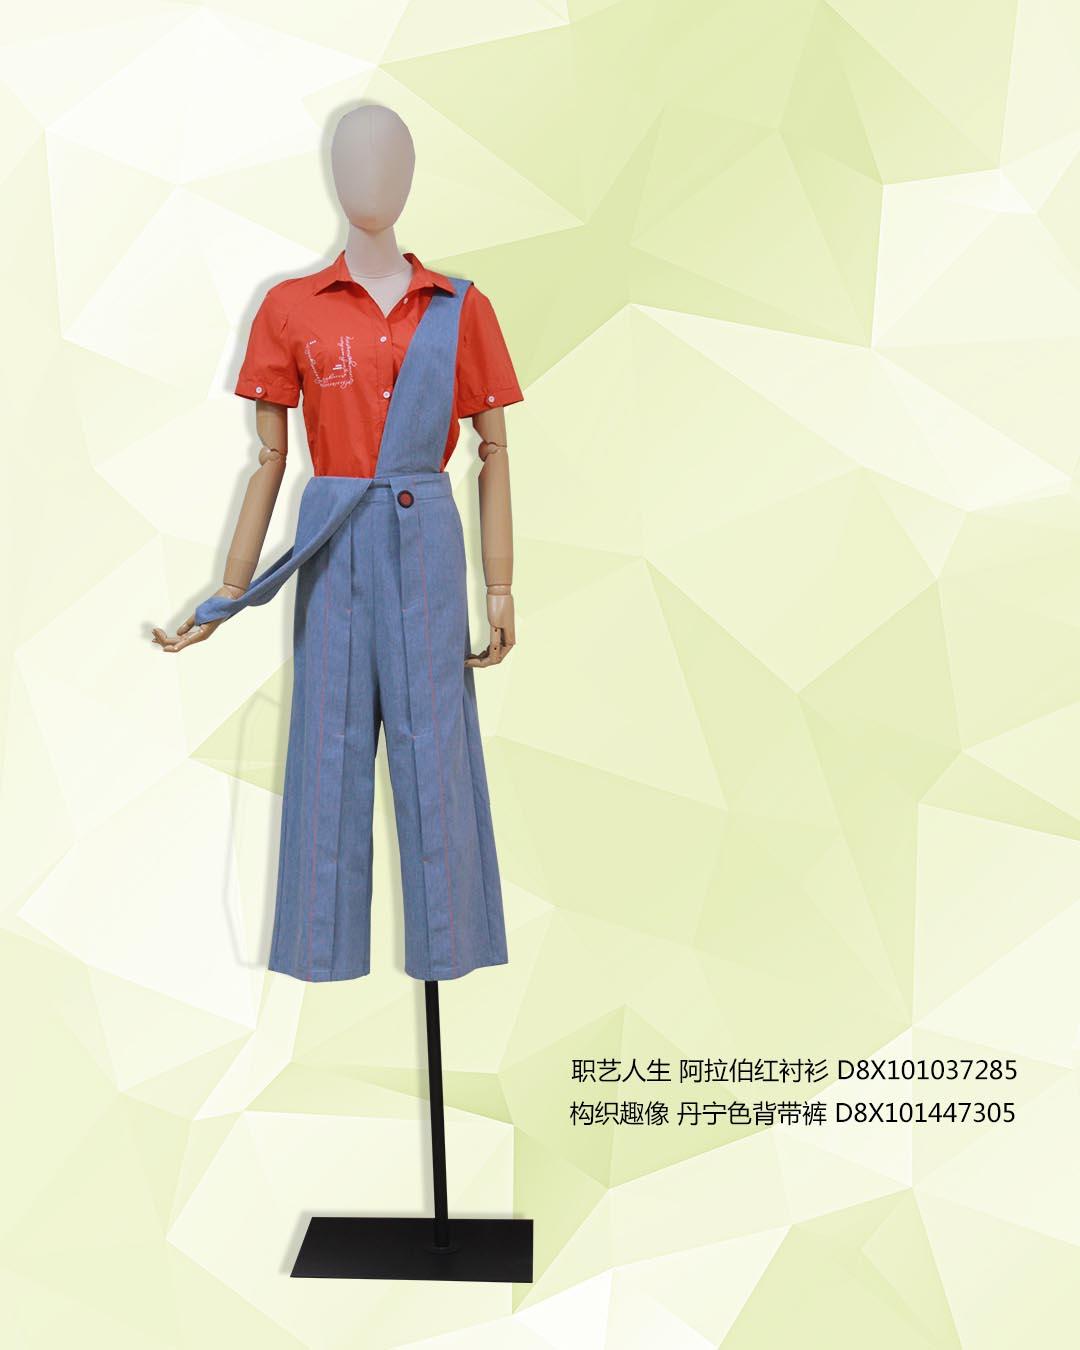 DILUNNUNA 穿了这么多年衣服 你属于哪种风格呢?